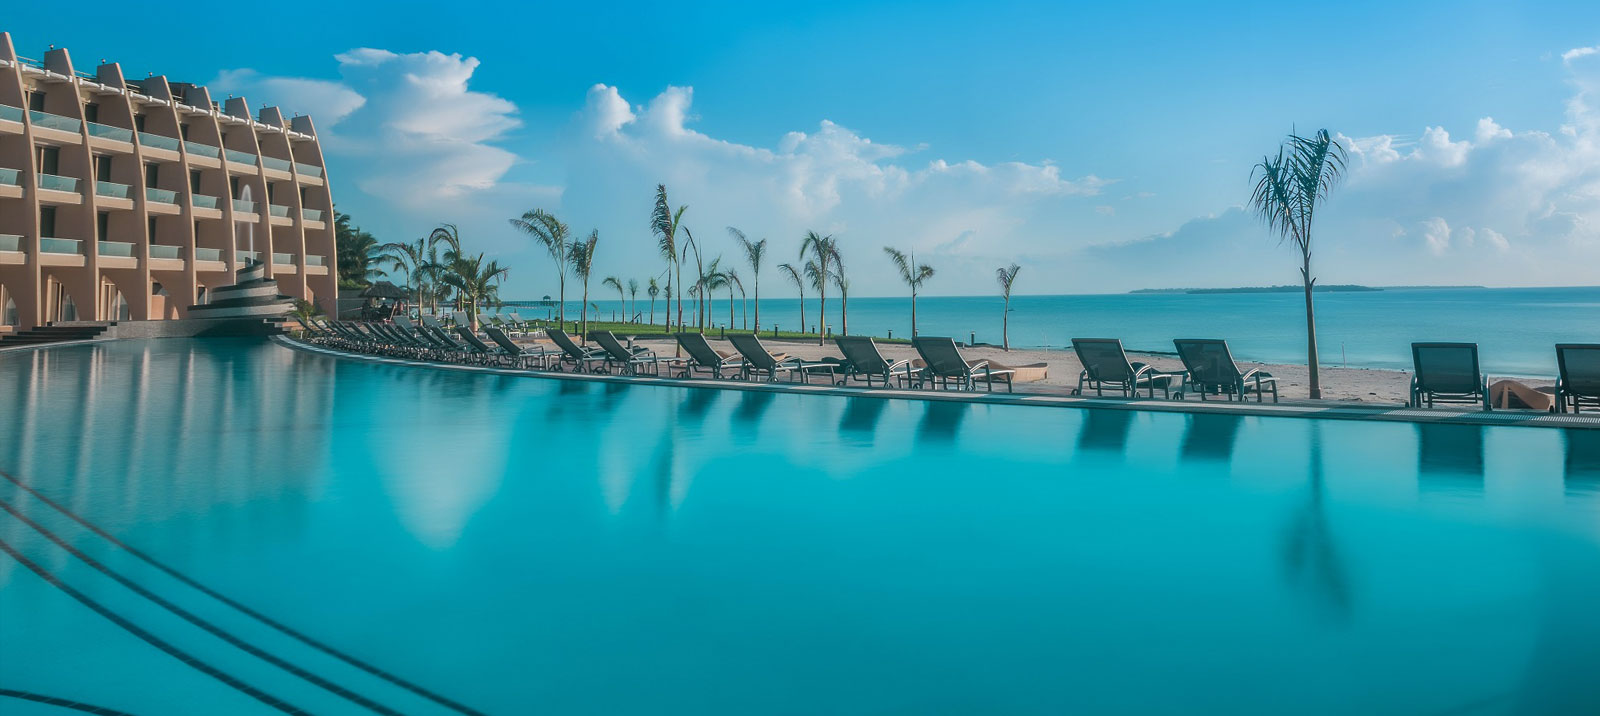 Huduma ndani ya Ramada Resort Dar es sSalaam